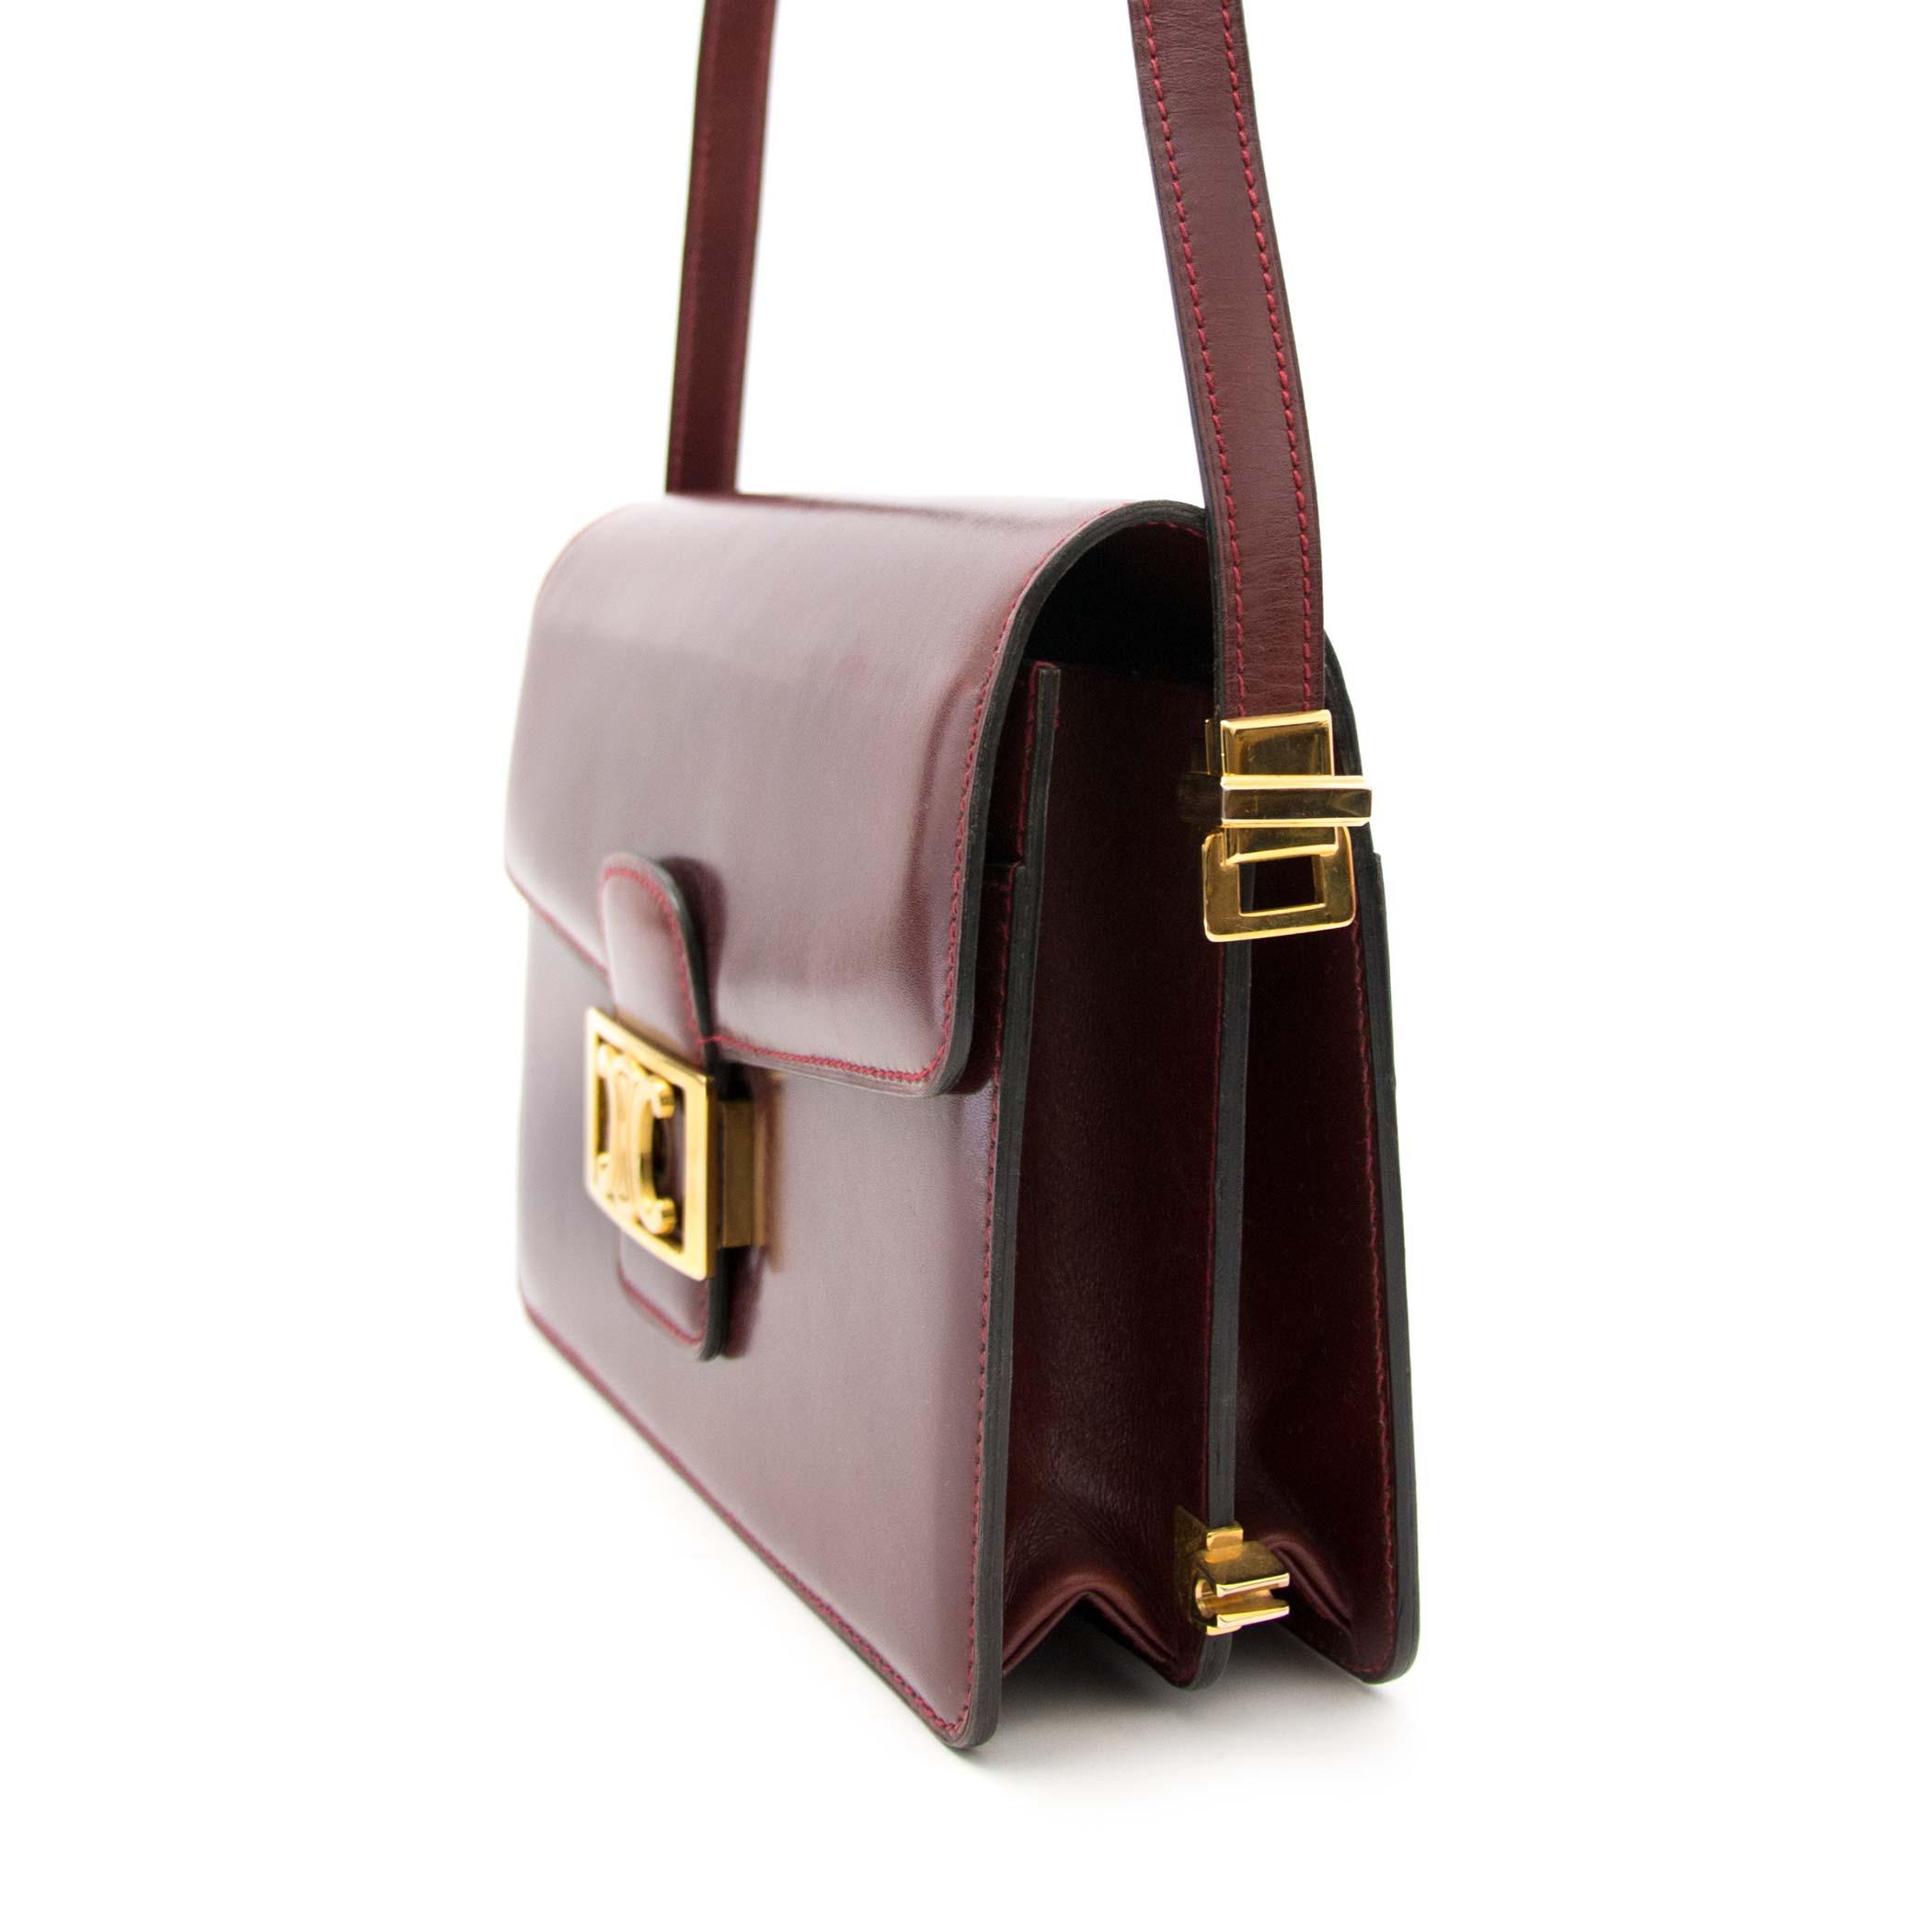 Céline Burgundy Crossbody Bag for sale in Labellov, Antwerp. Vintage designer items for sale.